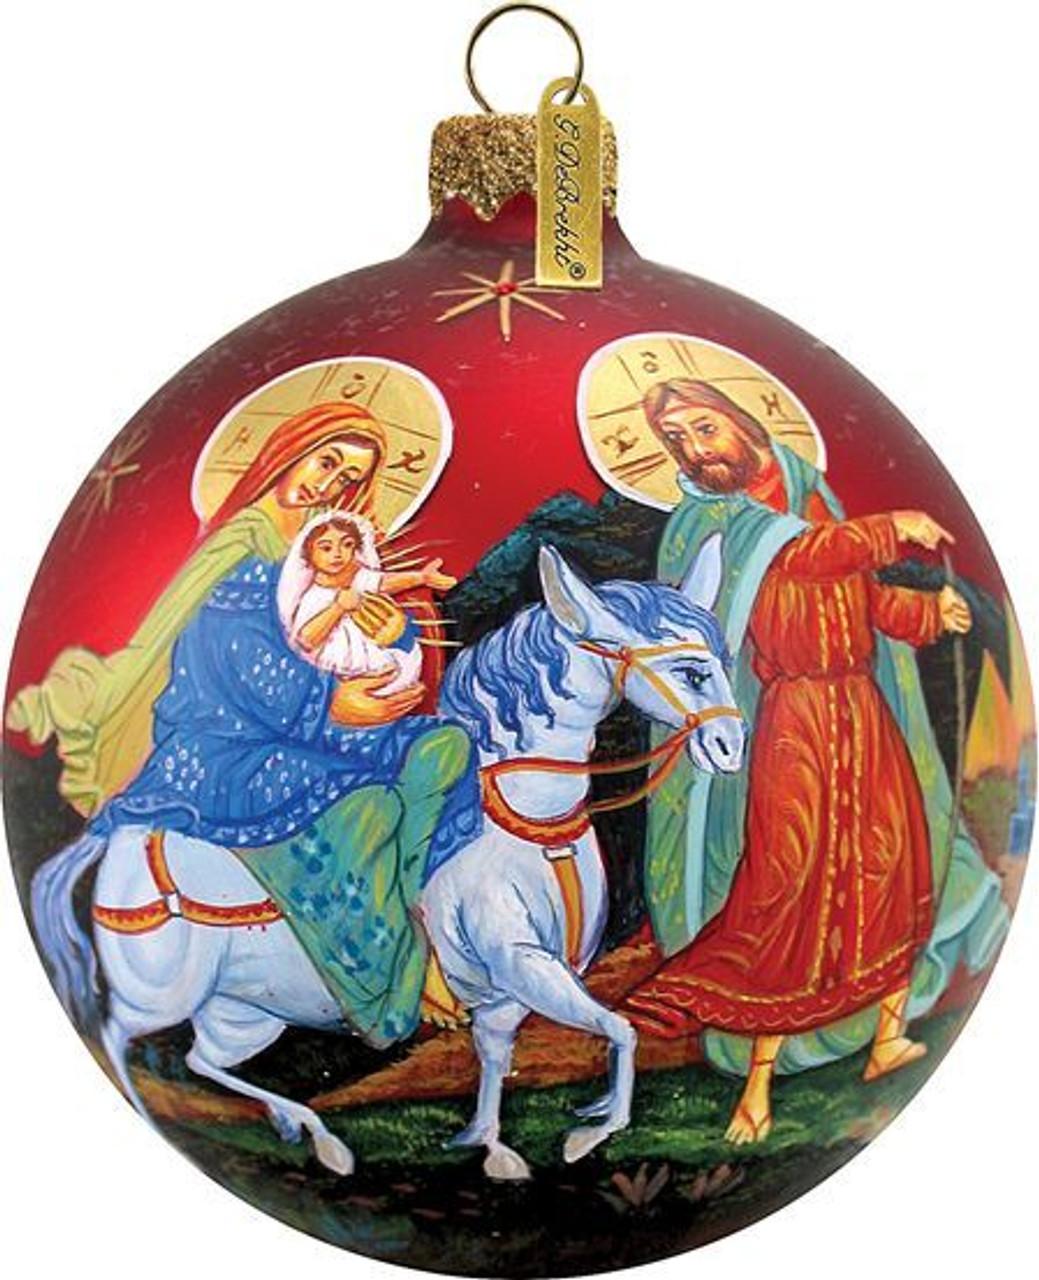 Vintage Religious Christmas Ornament: Holy Family Christmas Ornament